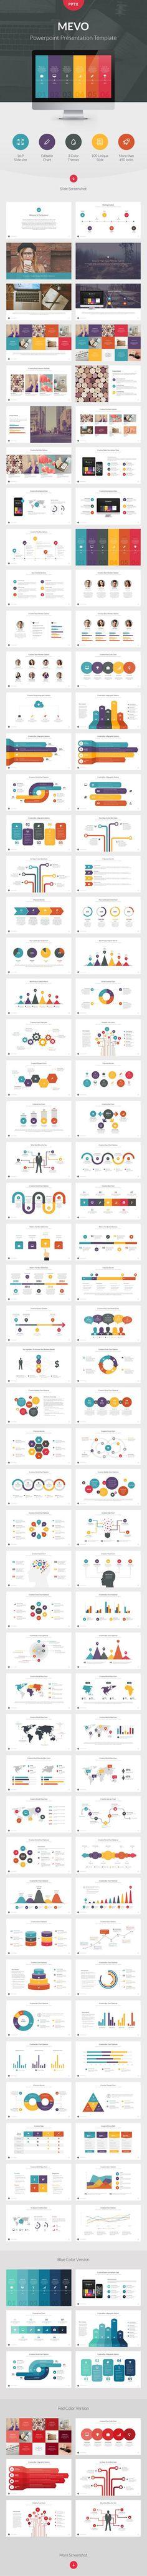 Mevo Powerpoint Presentation Template (Powerpoint Templates) Presentation